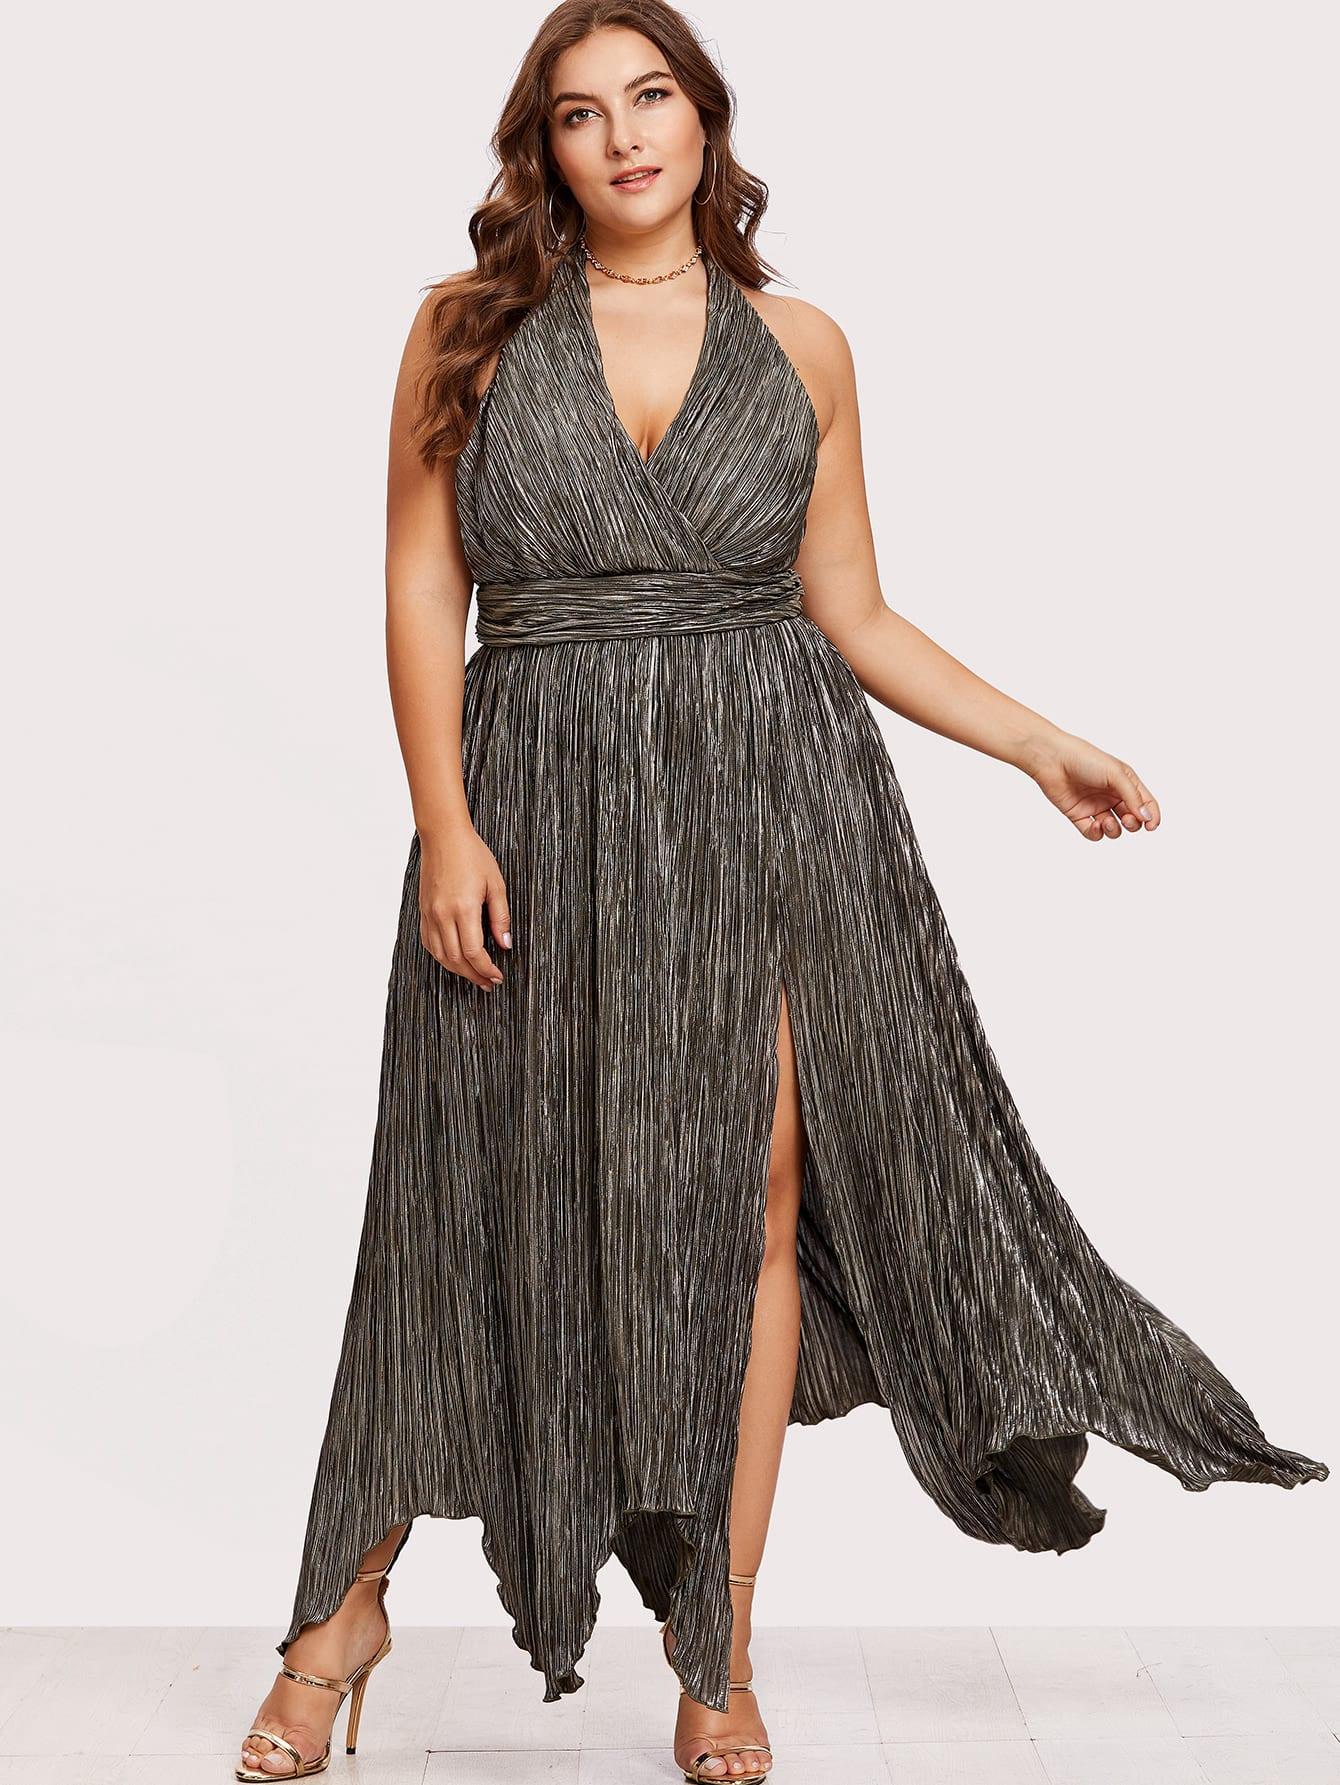 High Slit Hanky Hem Metallic Halter Dress high slit hanky hem metallic halter dress